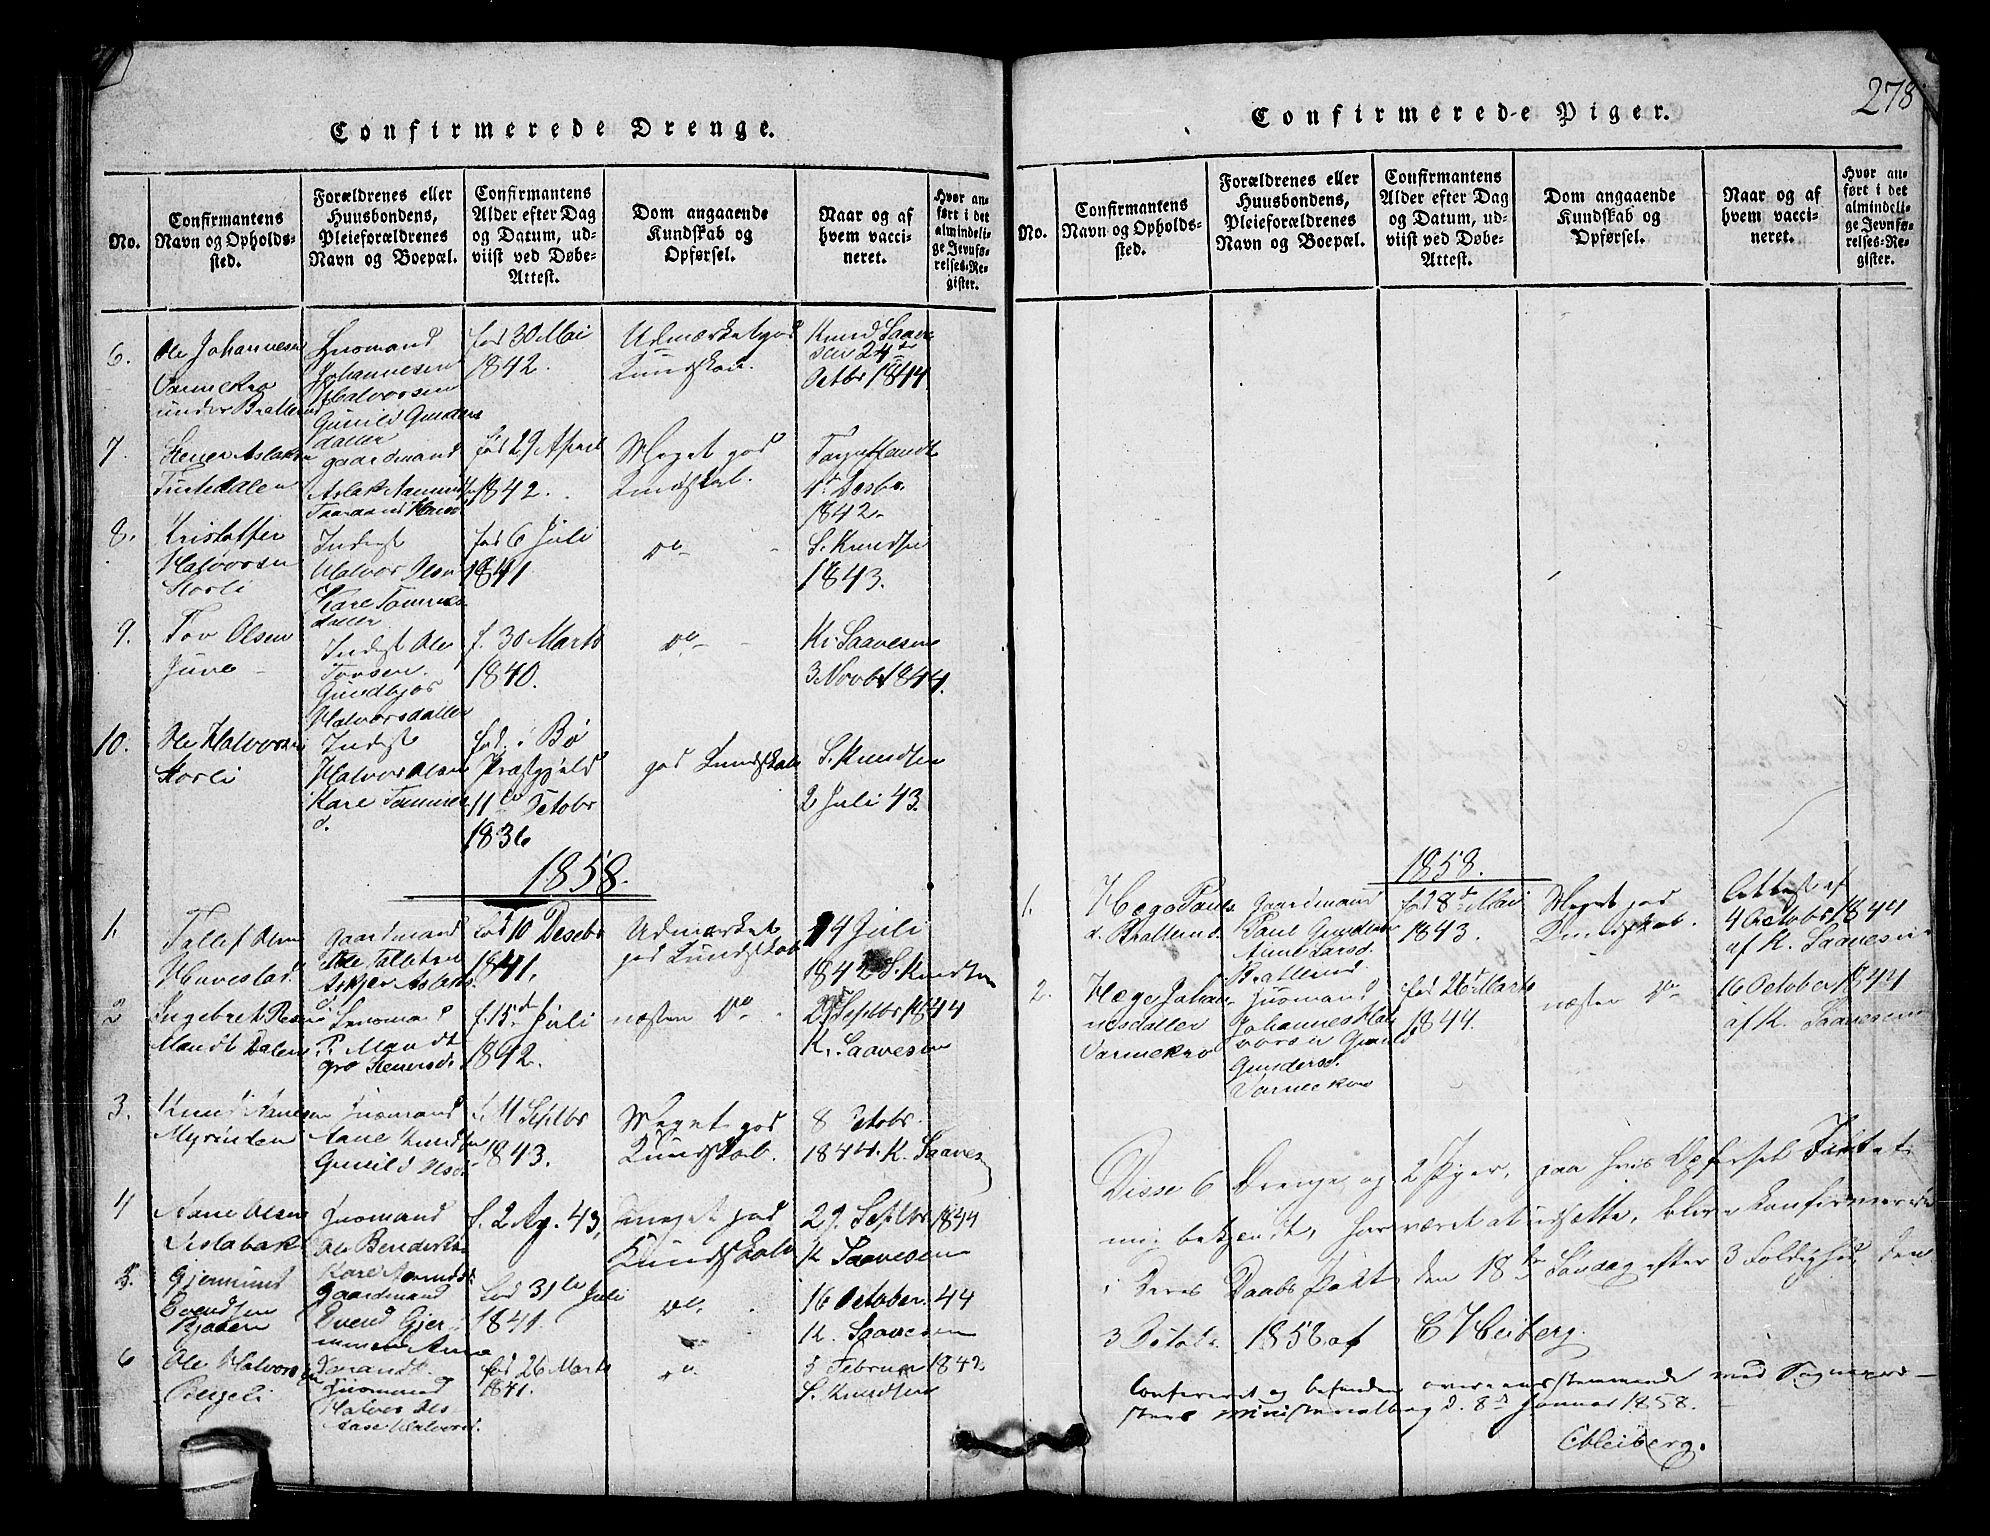 SAKO, Lårdal kirkebøker, G/Gb/L0001: Klokkerbok nr. II 1, 1815-1865, s. 278